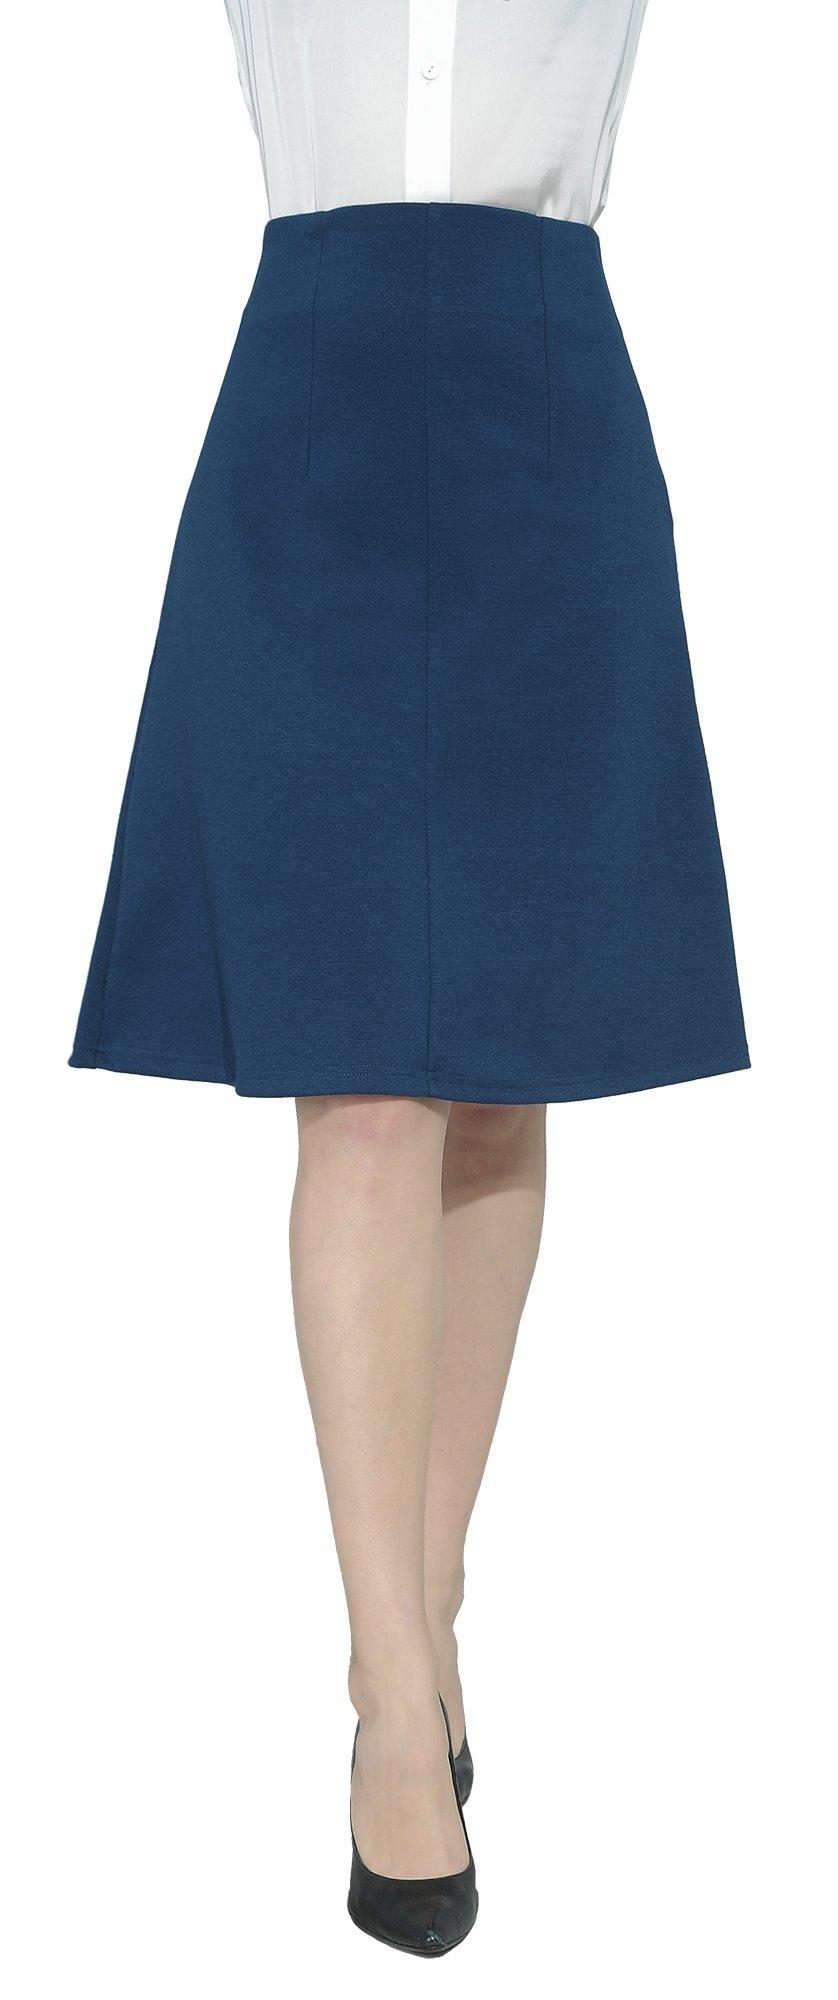 Marycrafts Women's Work Office Business Knee Flared A Line Midi Skirt XXL Dark Cyan